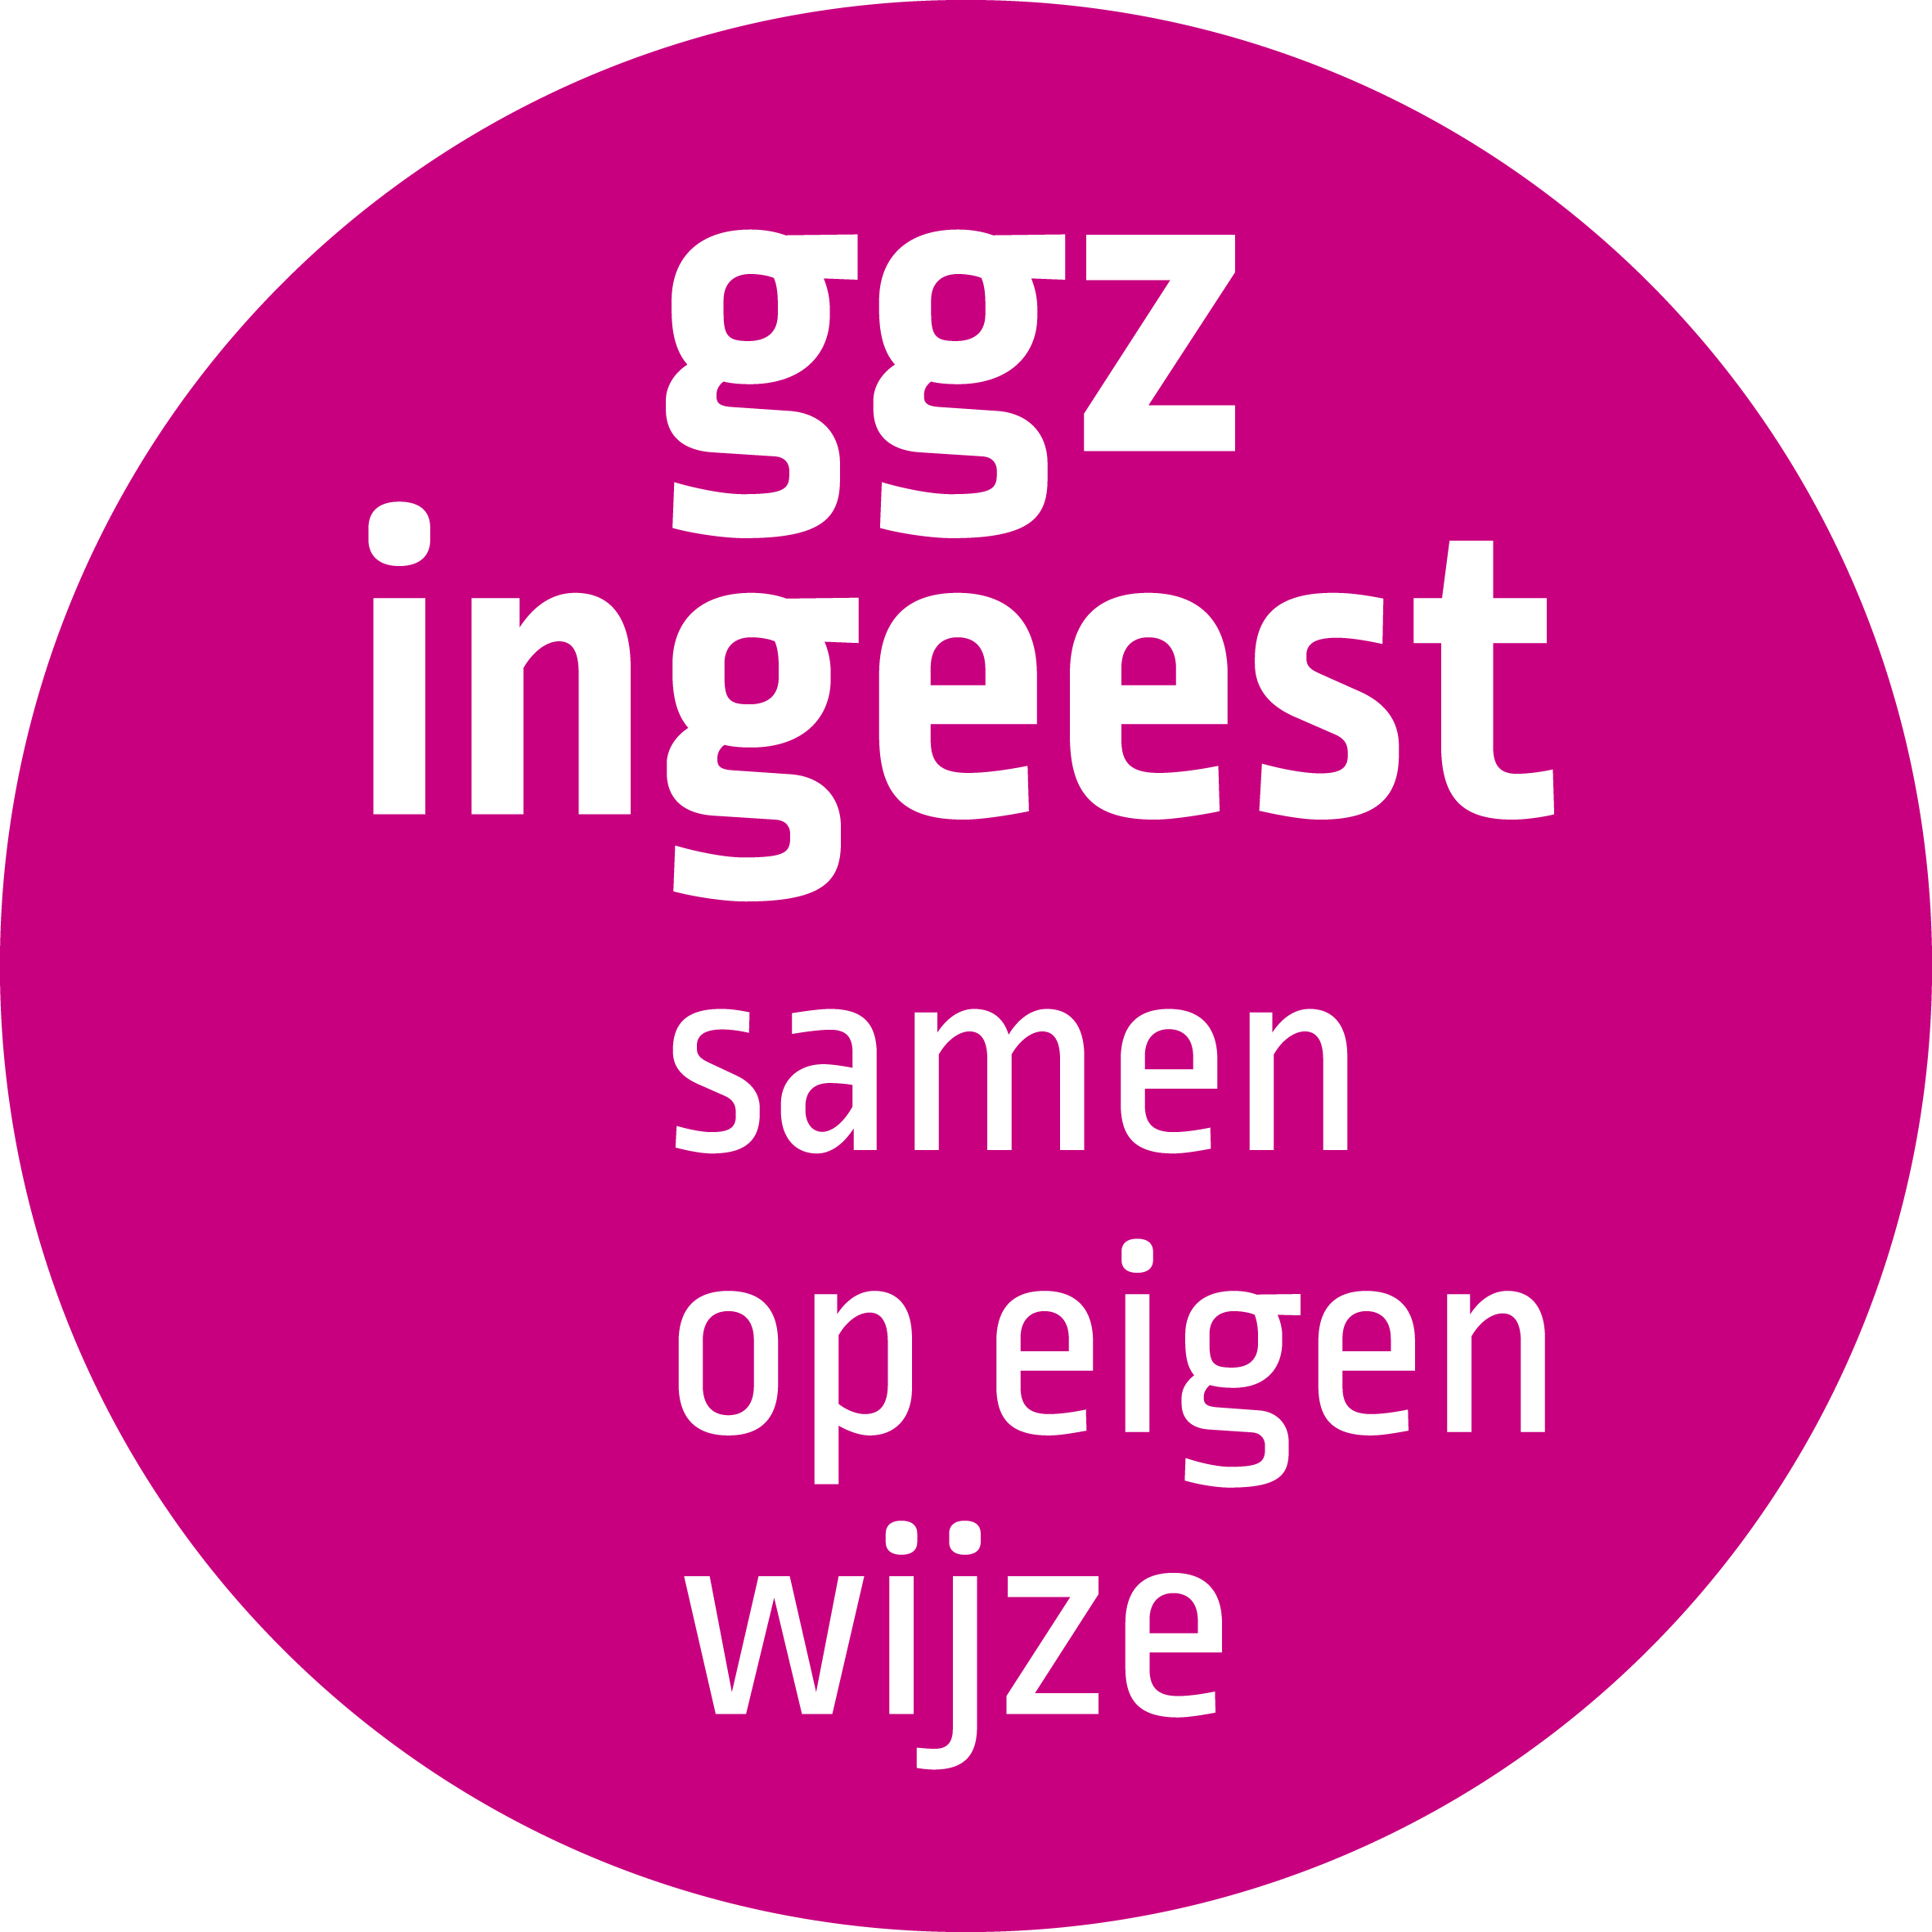 Amstelmere